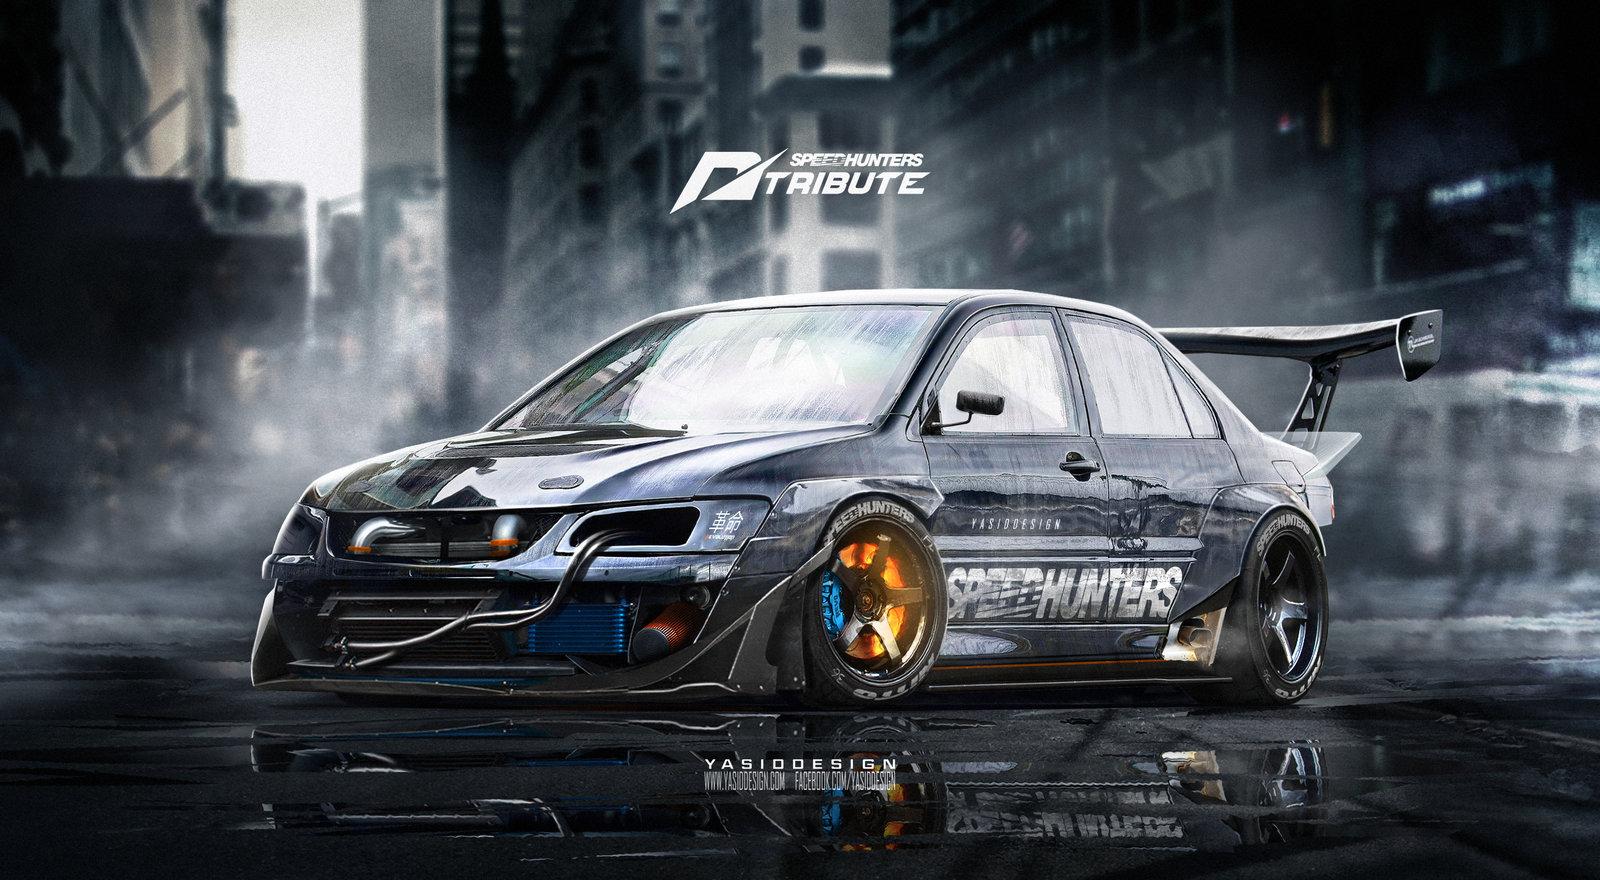 Speedhunters Mitsubishi Lancer EVO 9 _ Need for speed tribute